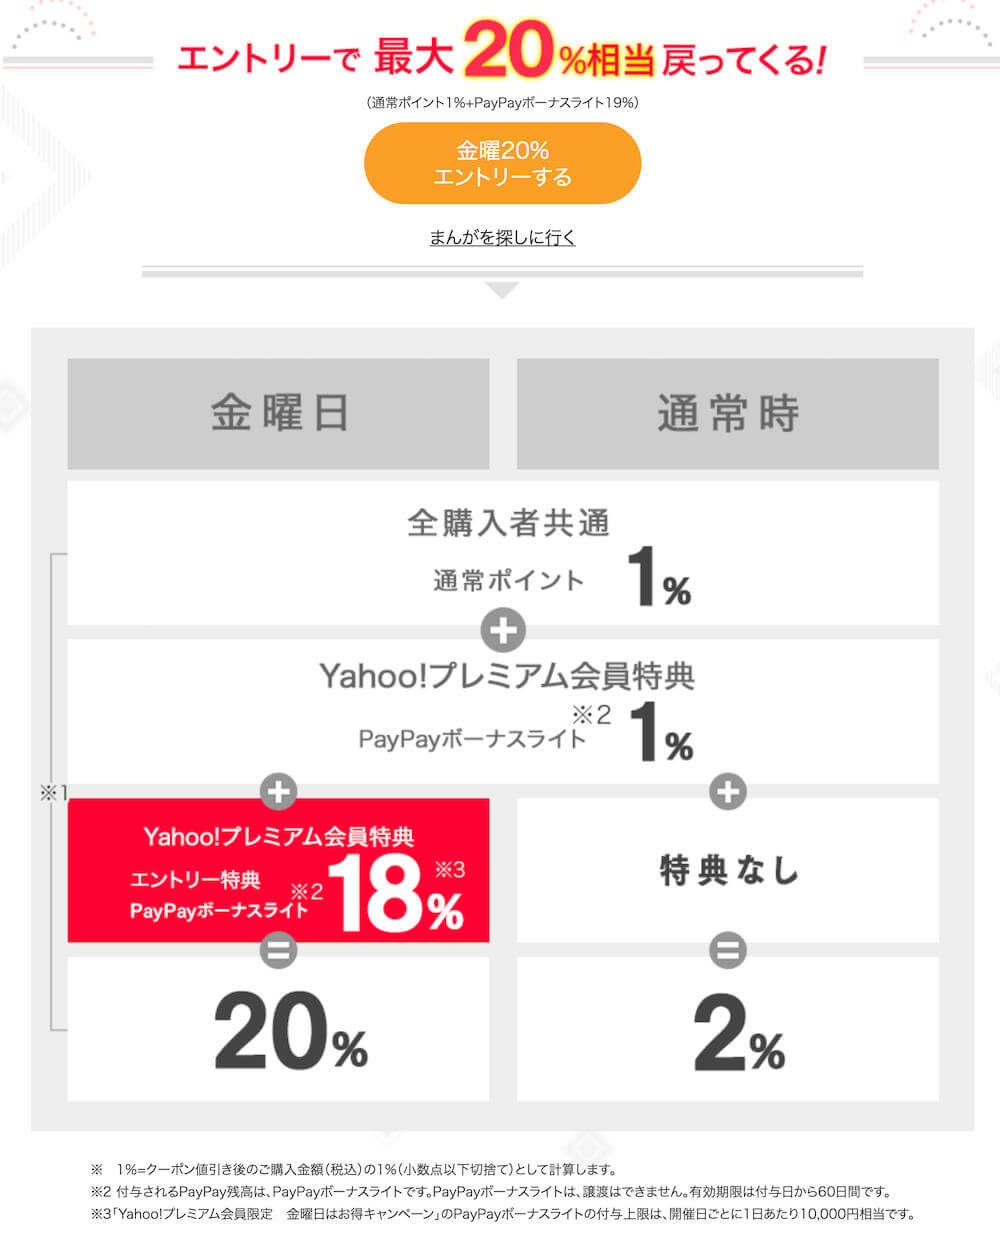 ebookjapan 金曜日 PayPay ボーナスポイント 20倍